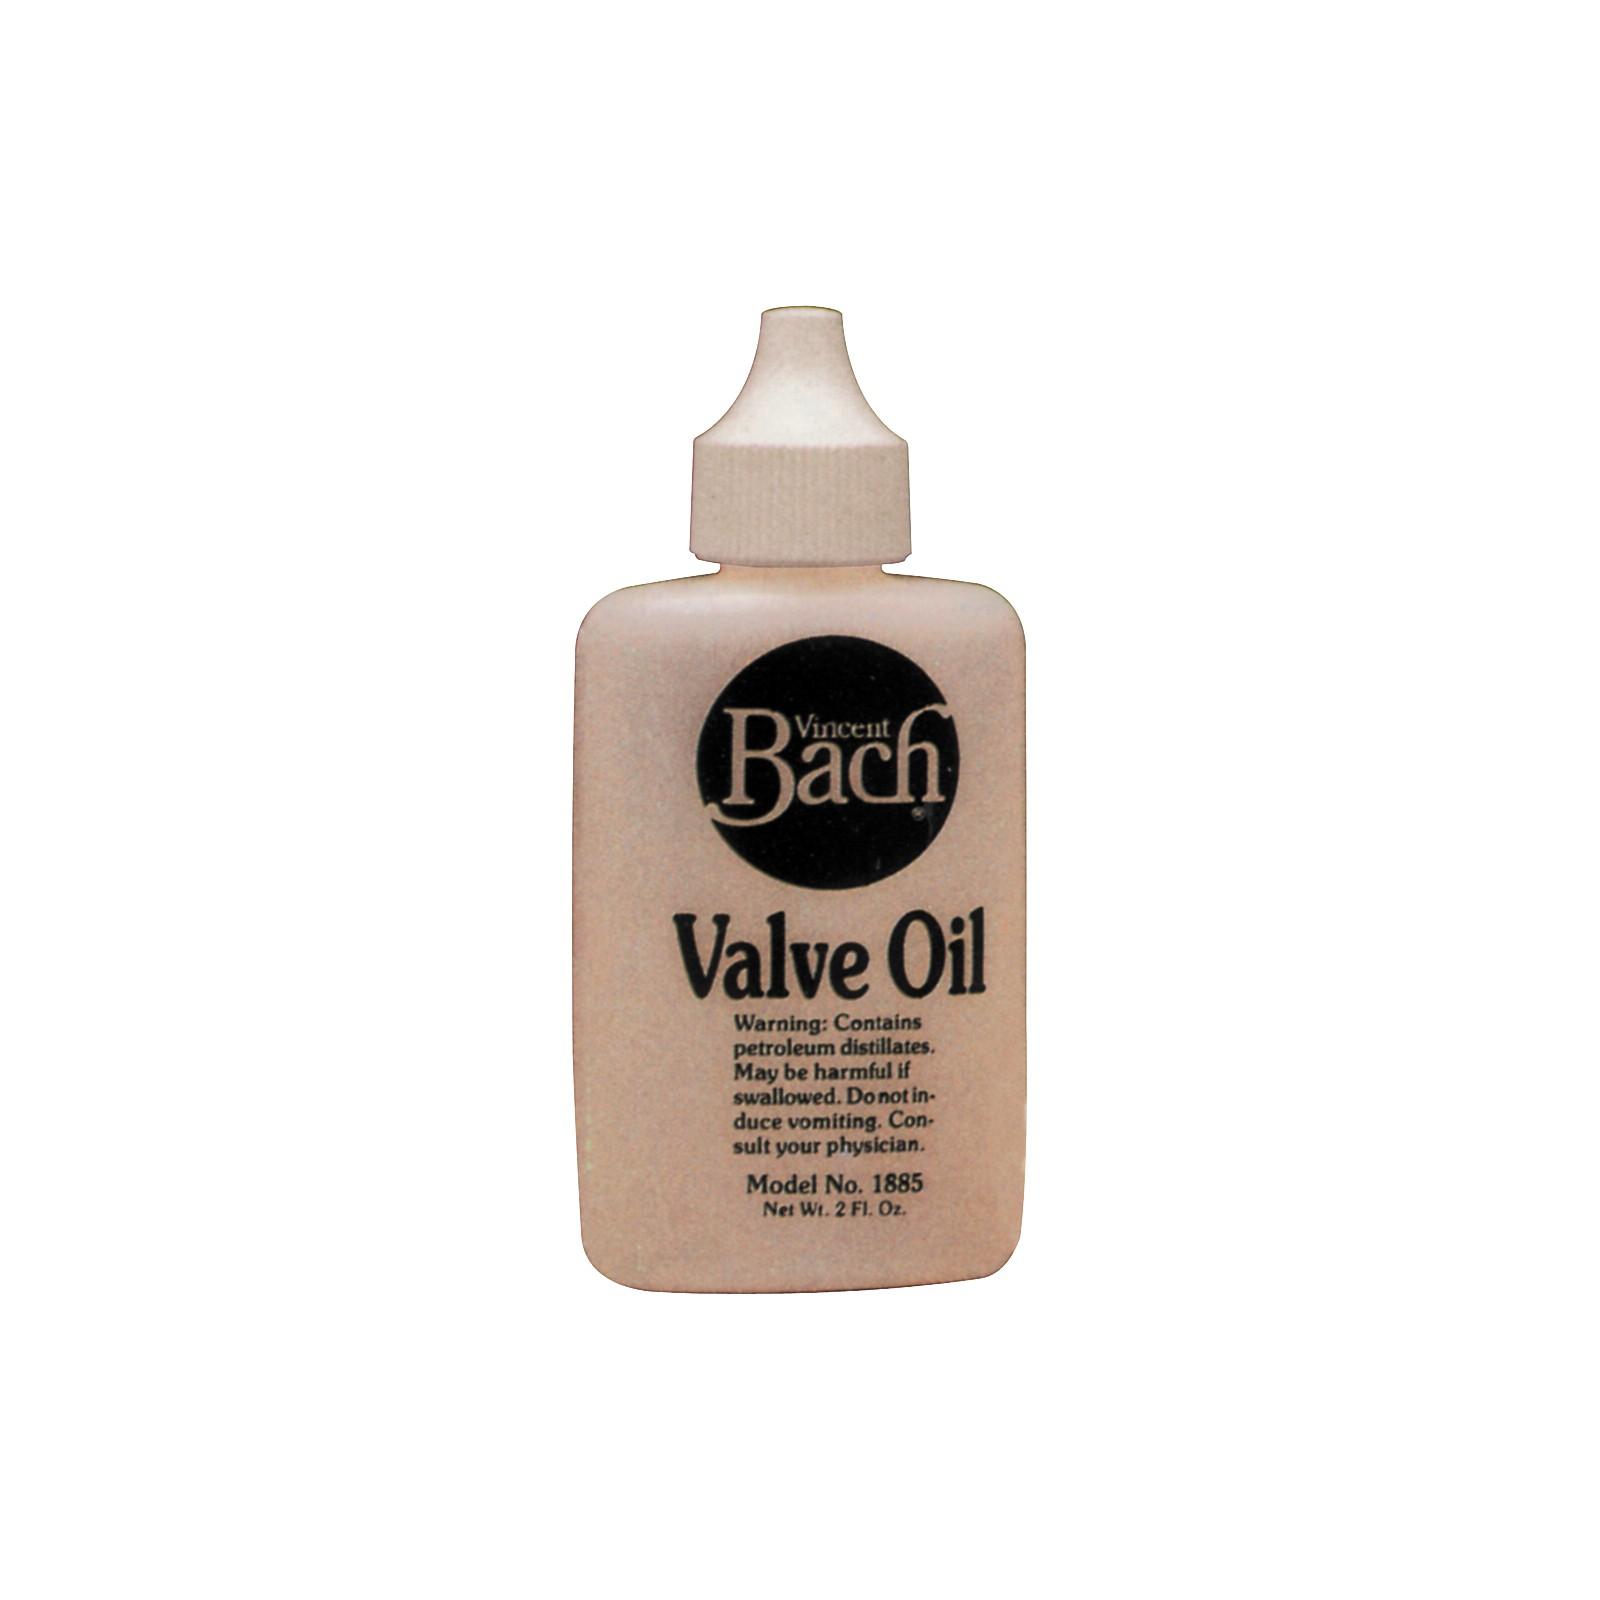 Bach 1885 Valve Oil 1.6 oz Regular